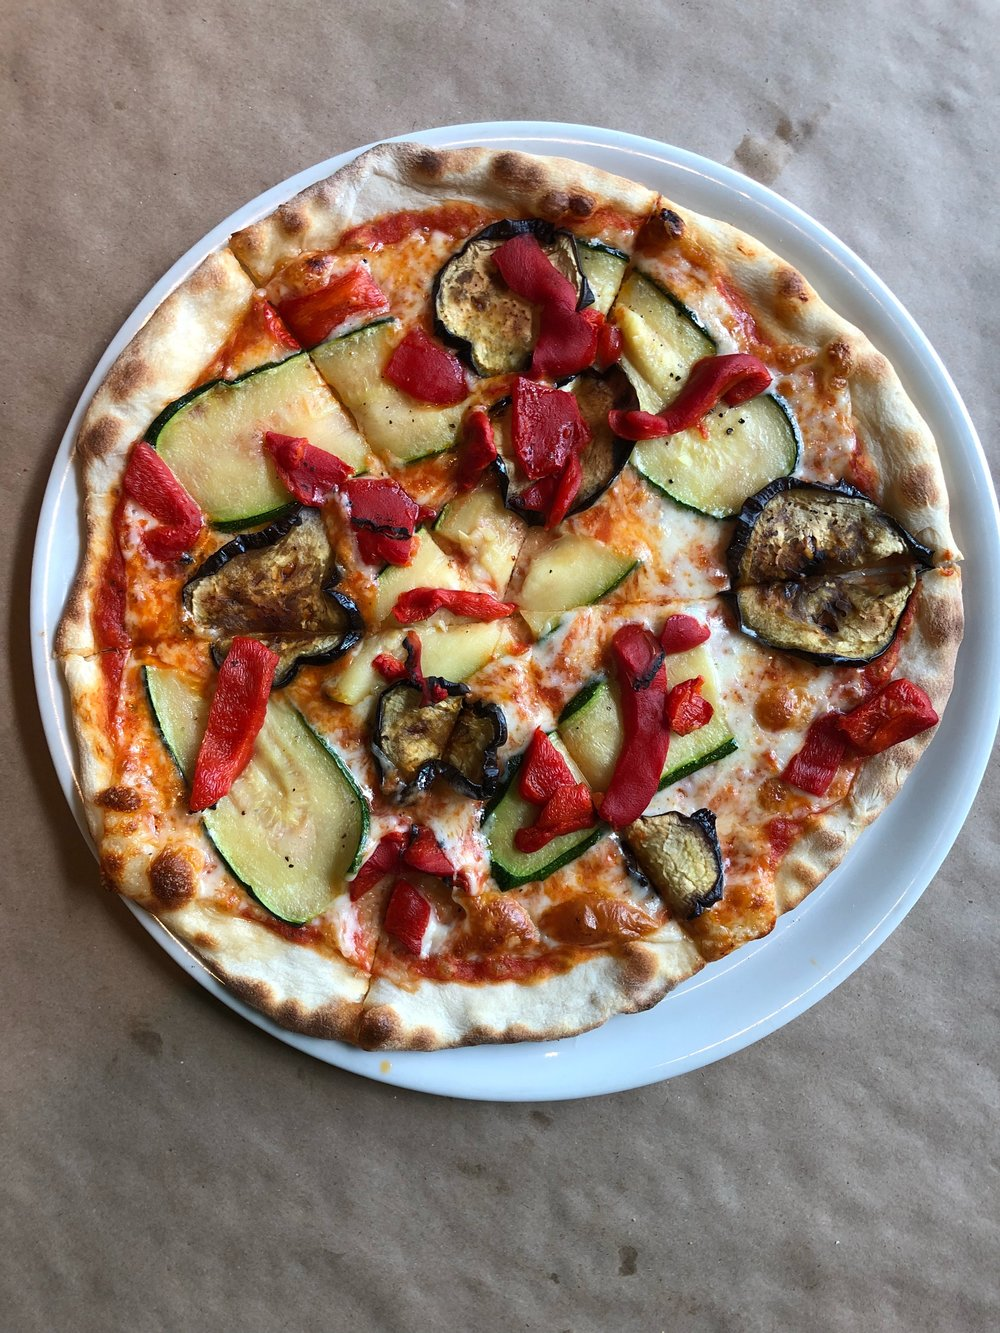 Ortolana - tomato sauce, whole milk mozzarela, roasted red peppers, eggplant, zuucchini